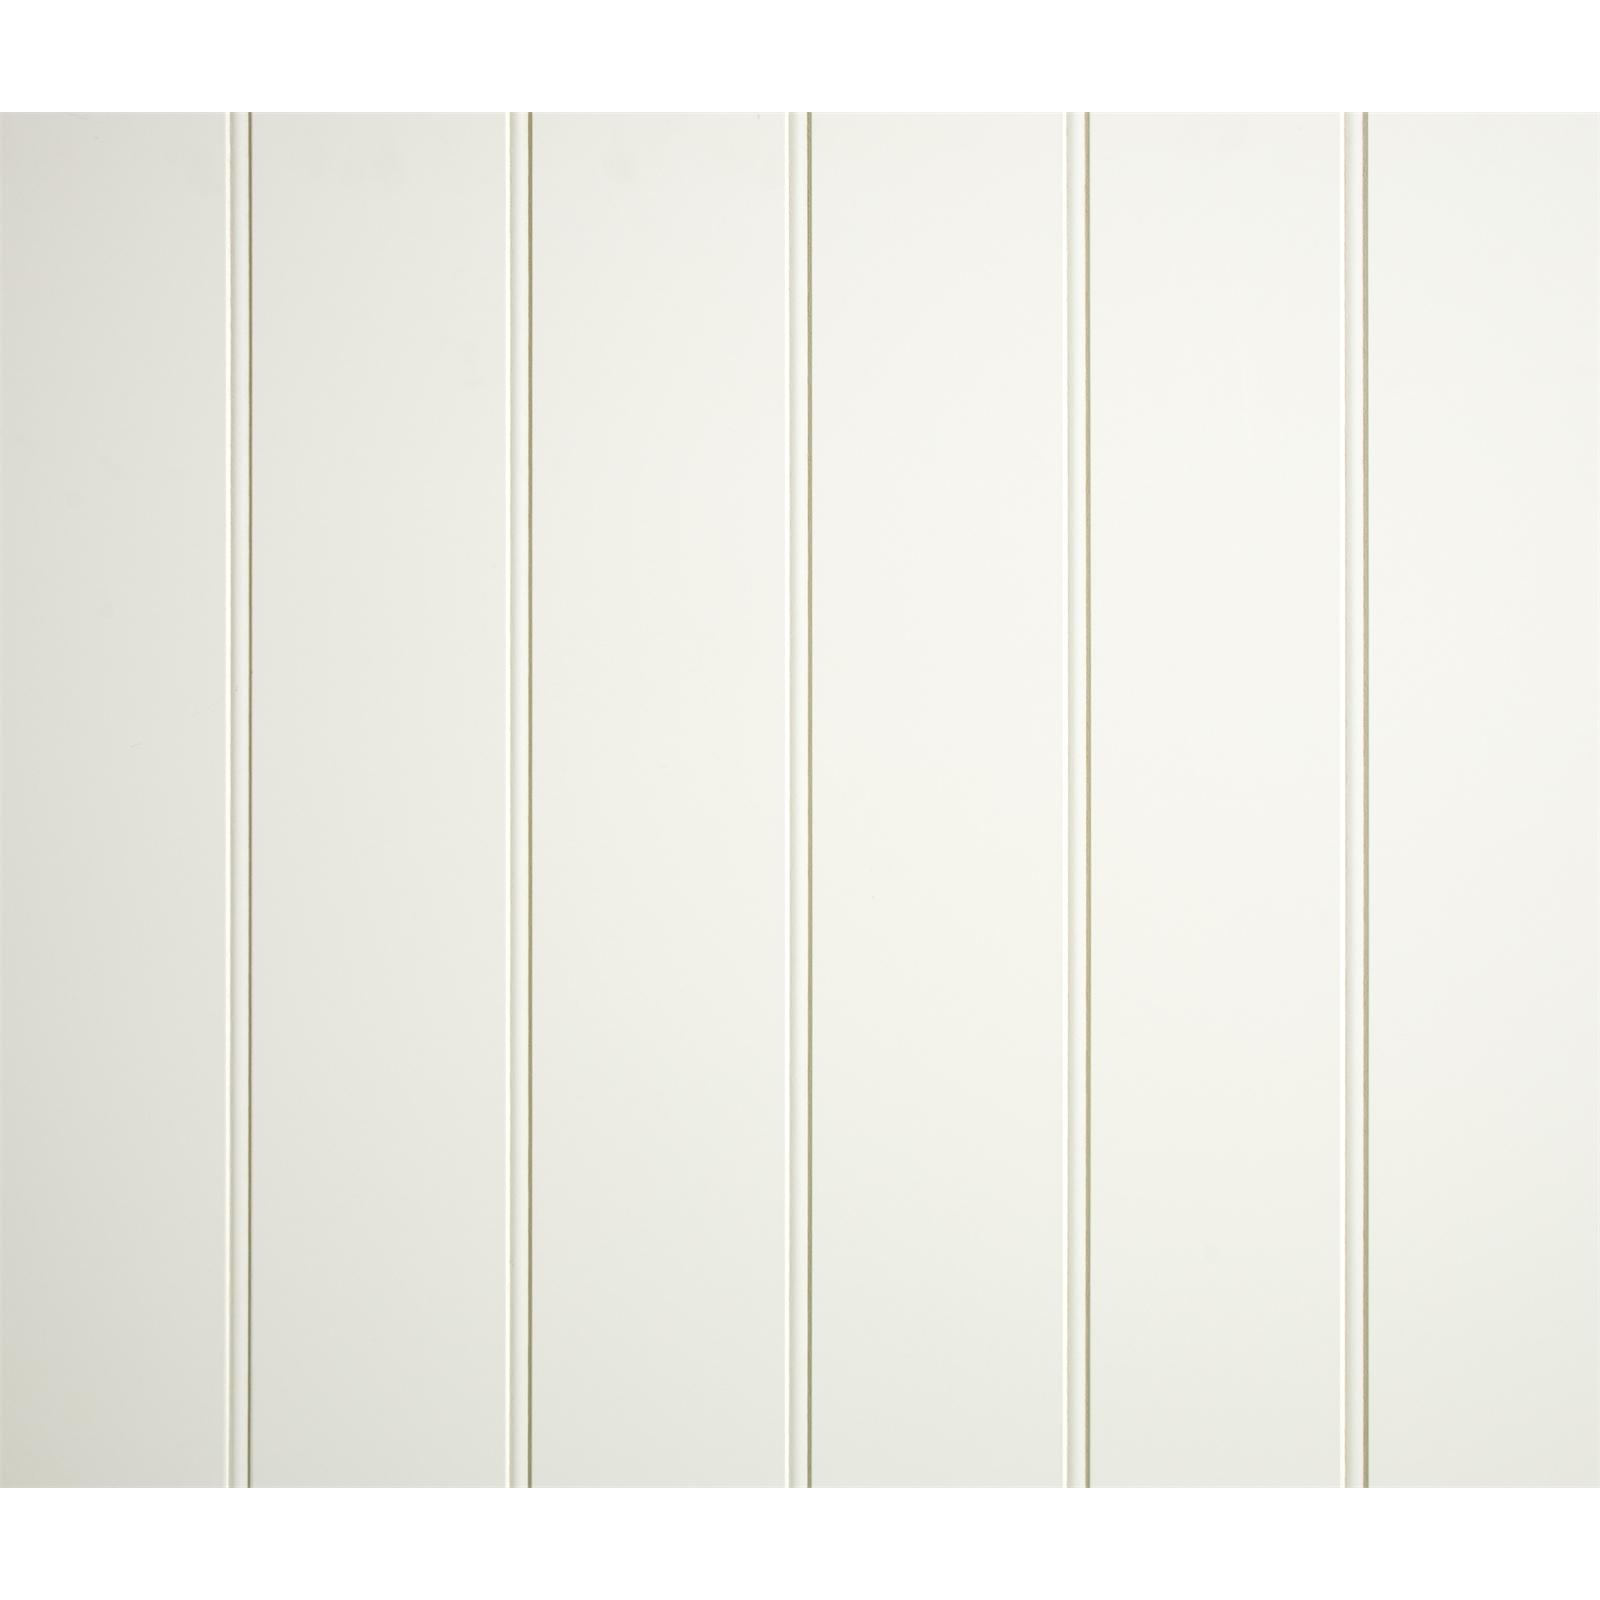 Easycraft EasyREGENCY 900 x 1200 x 9mm Primed MDF Interior Wall Linings